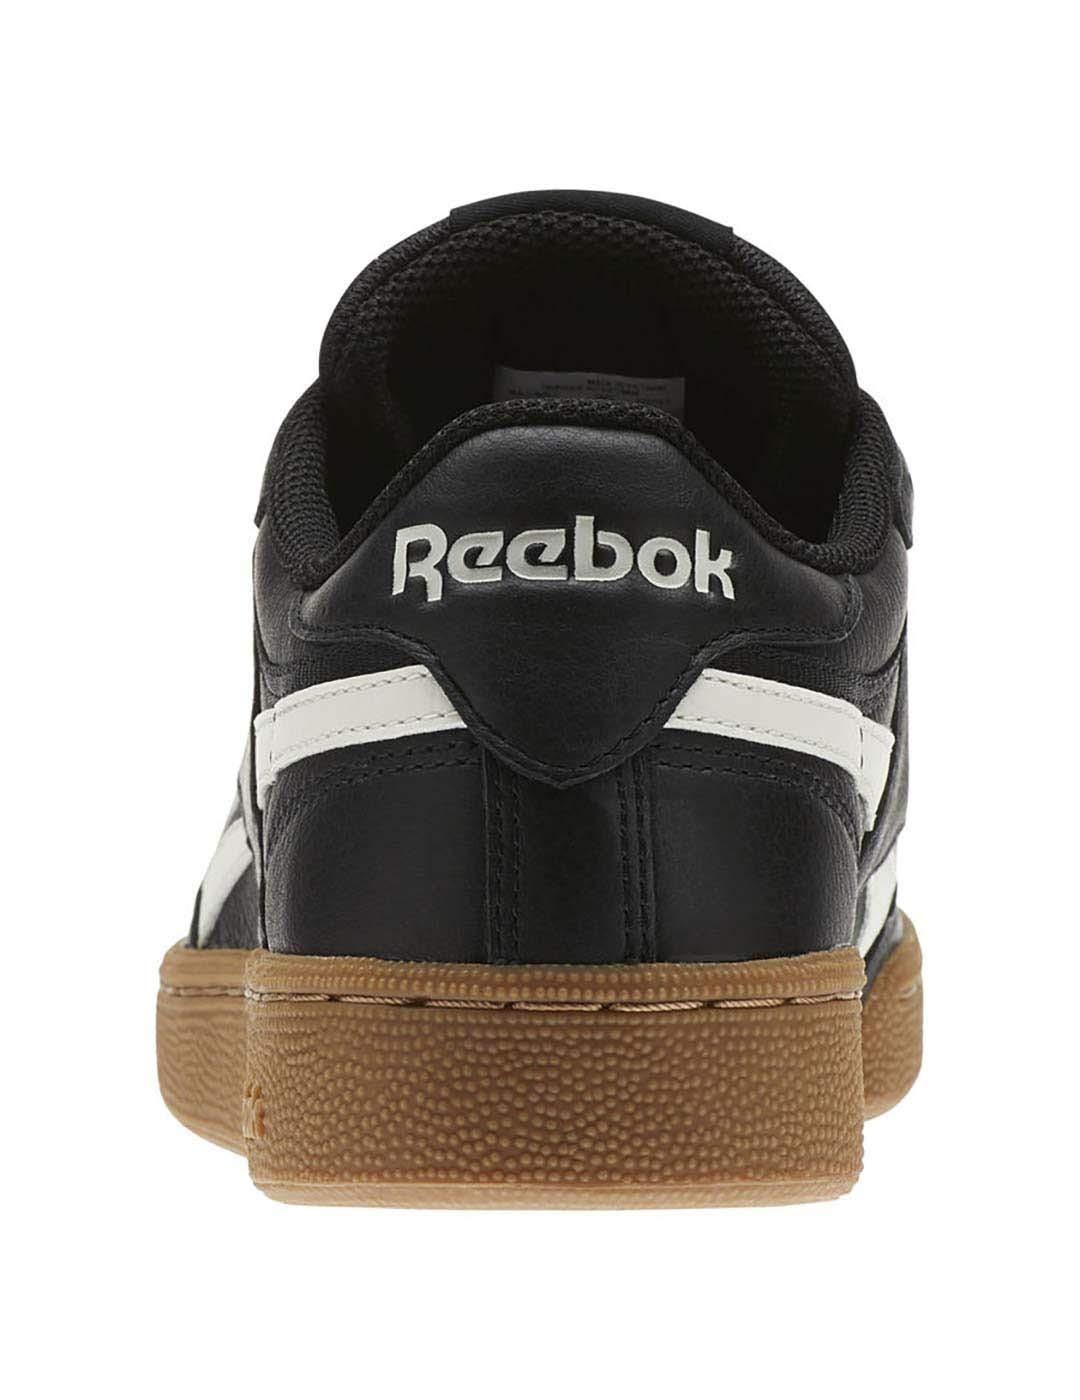 Reebok Revenge Plus Mu Zapatillas Hombre Negro: Amazon.es